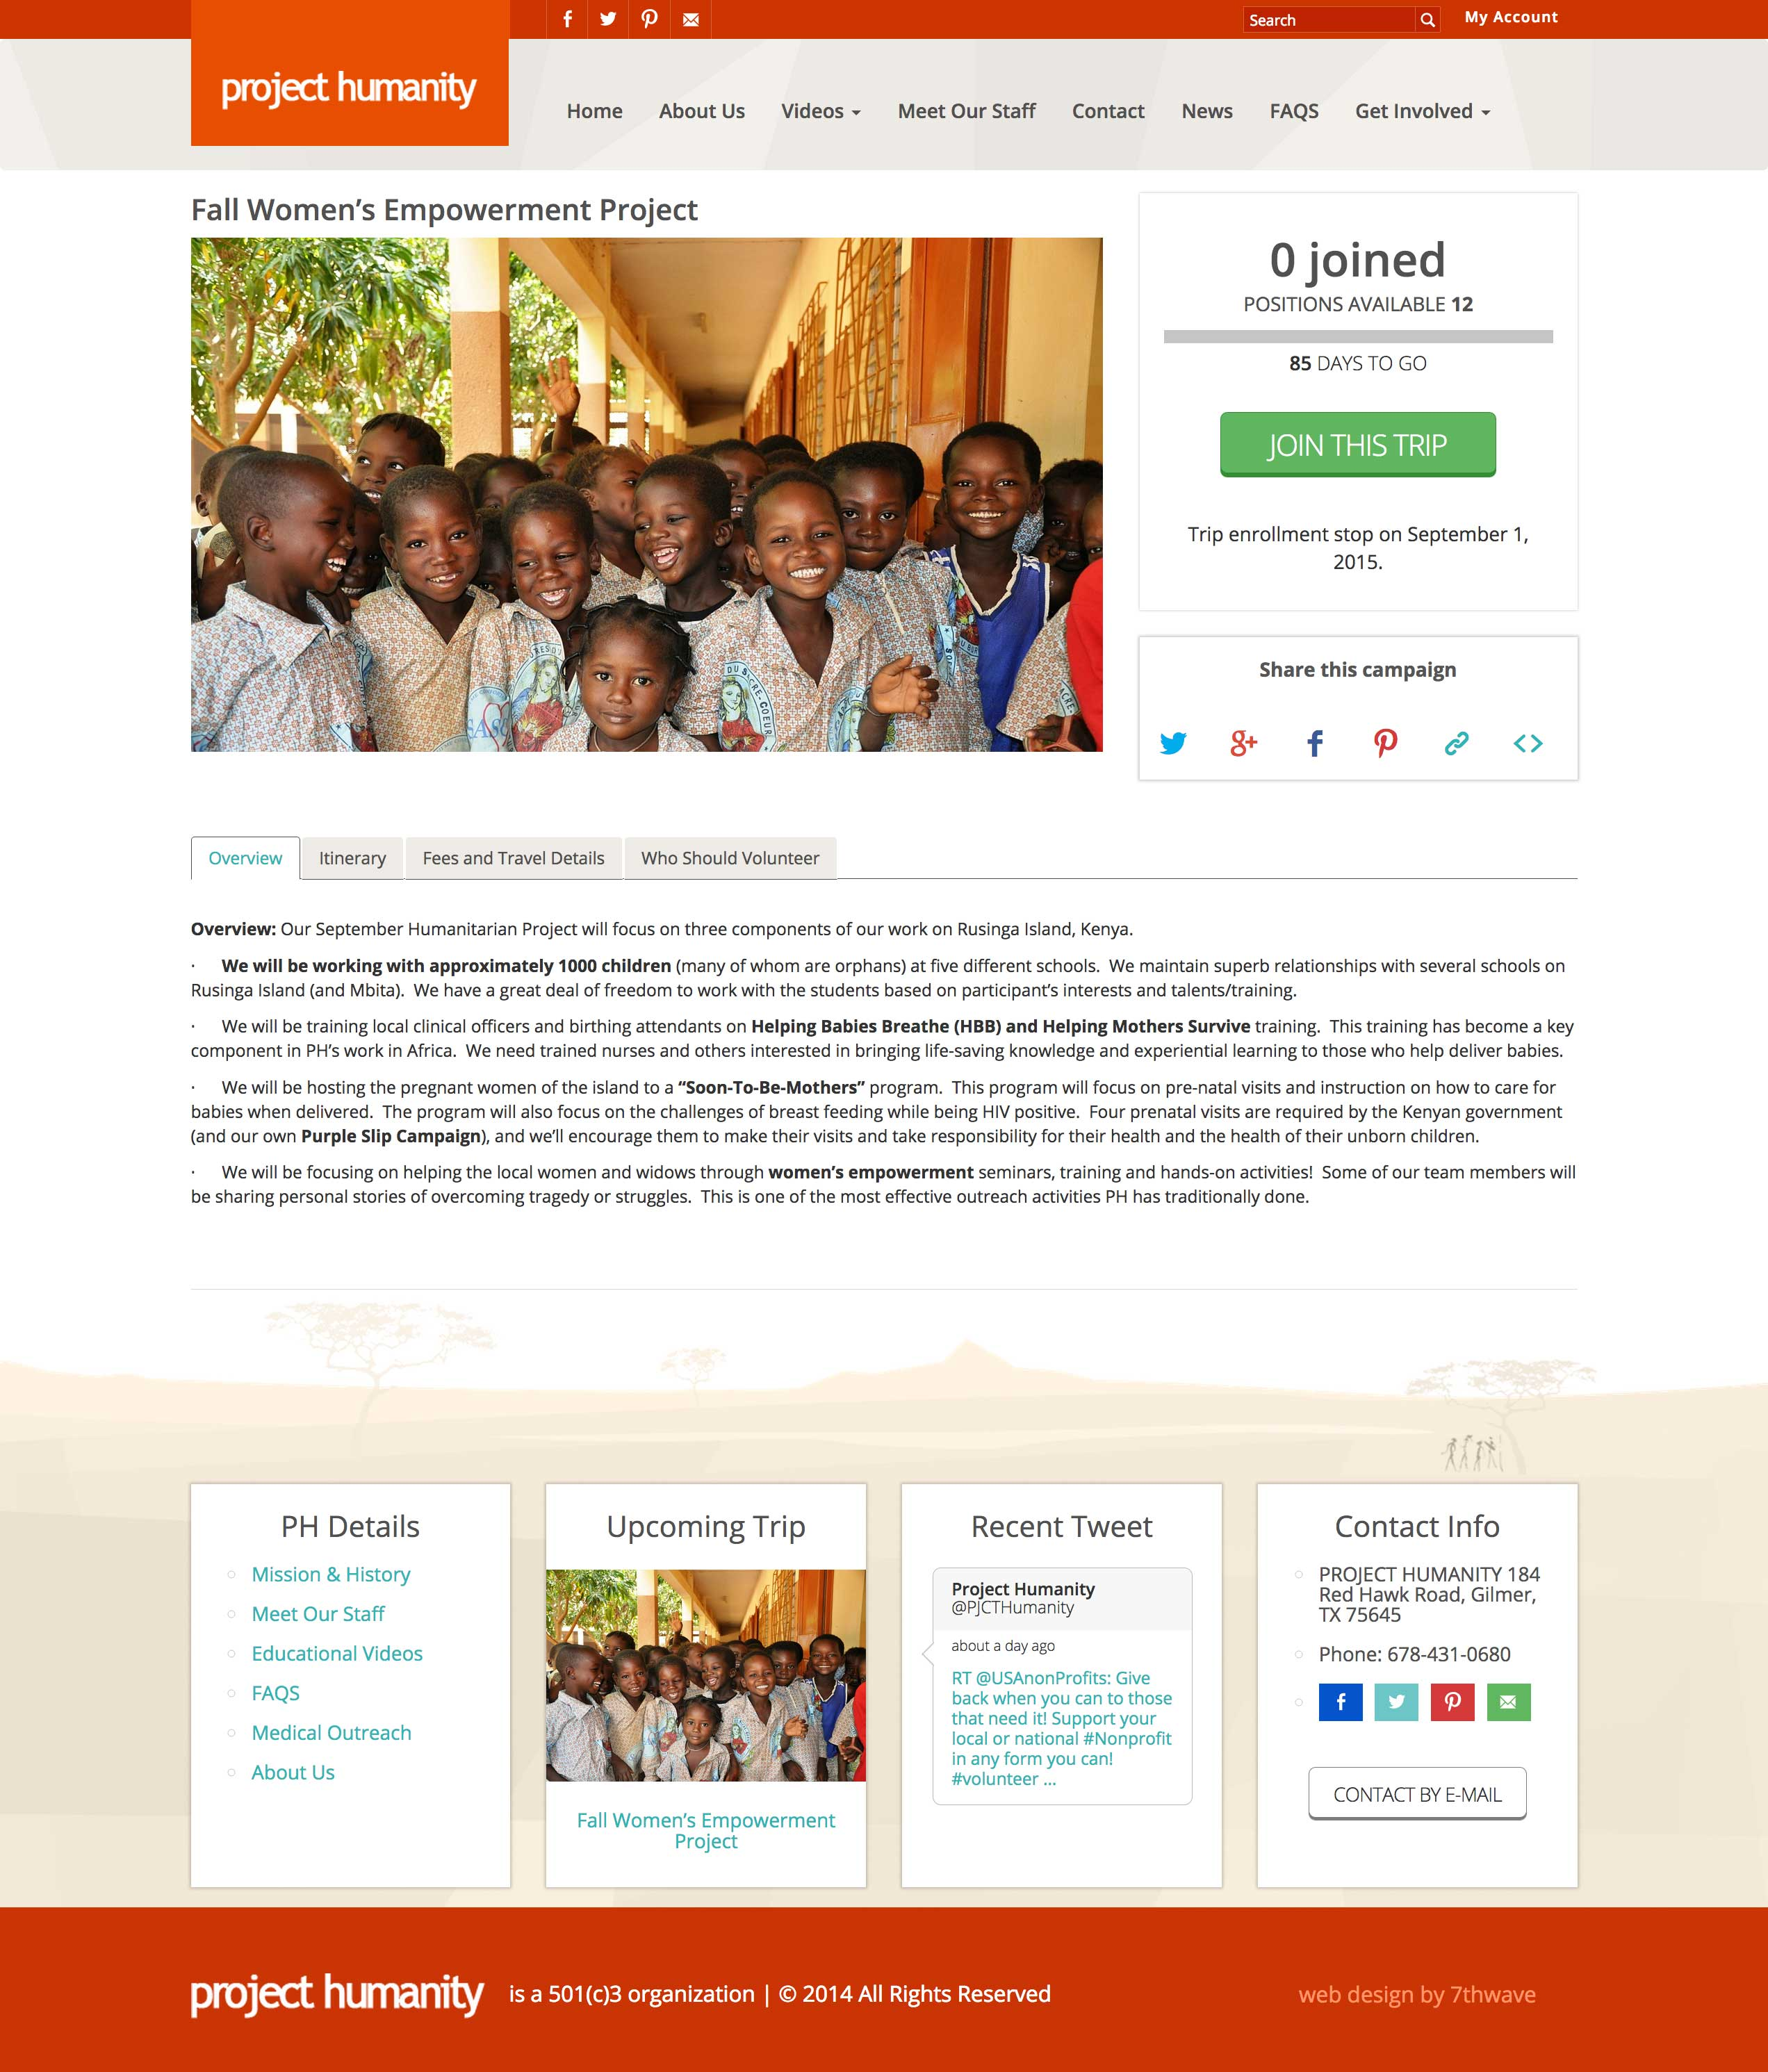 projecthumanity-web-design-videos